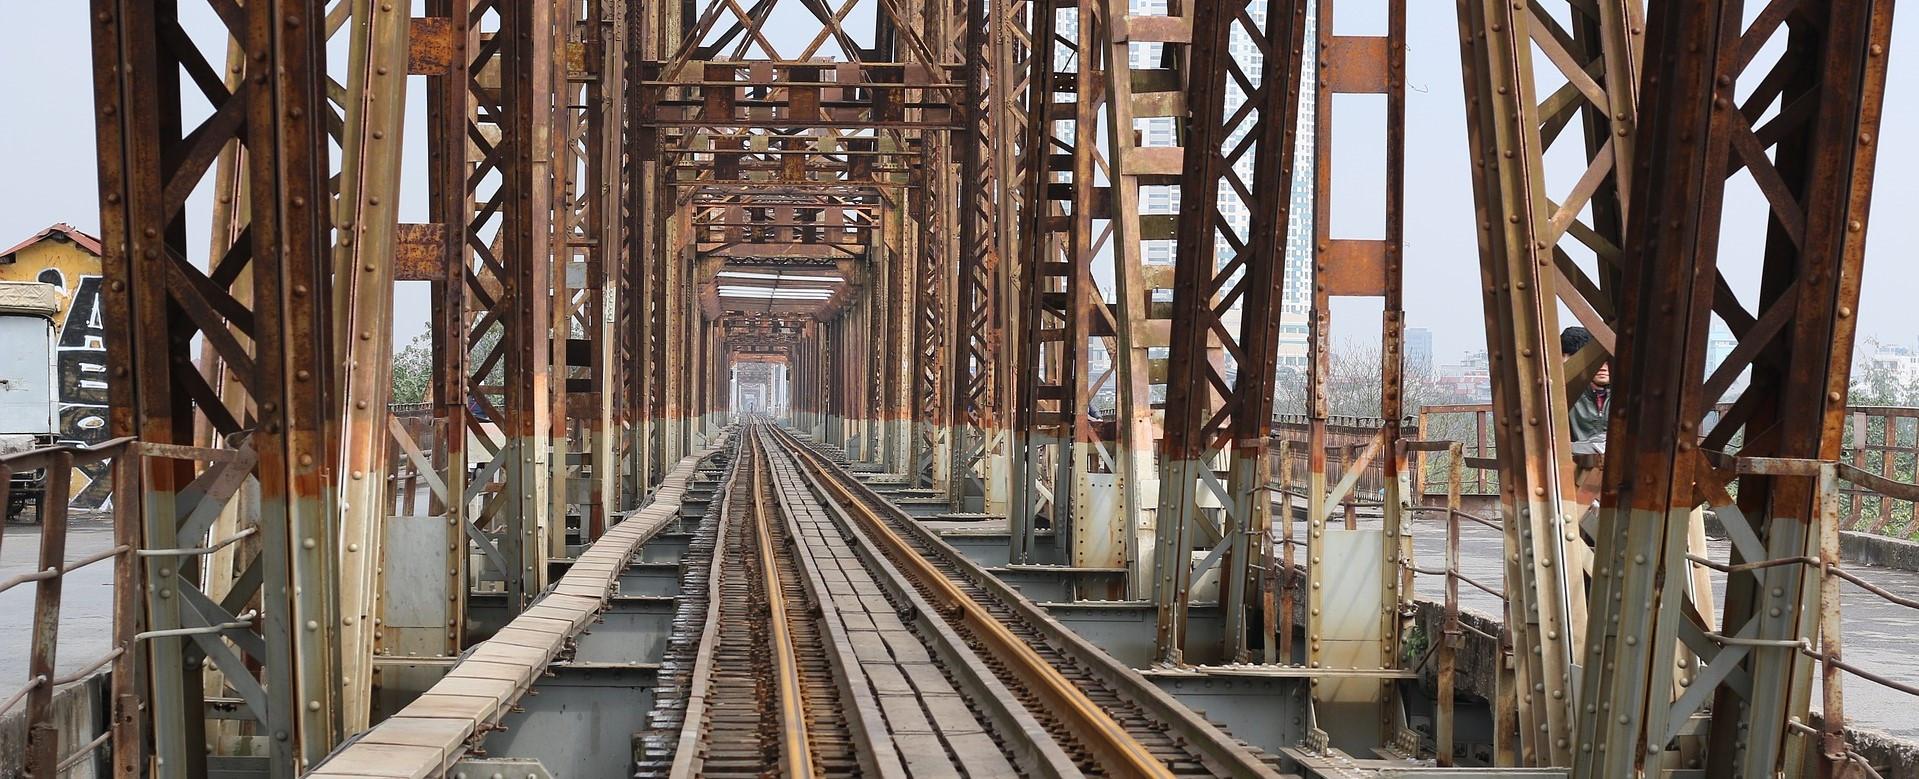 hanoi-long-bien-bridge-2-resized2-1